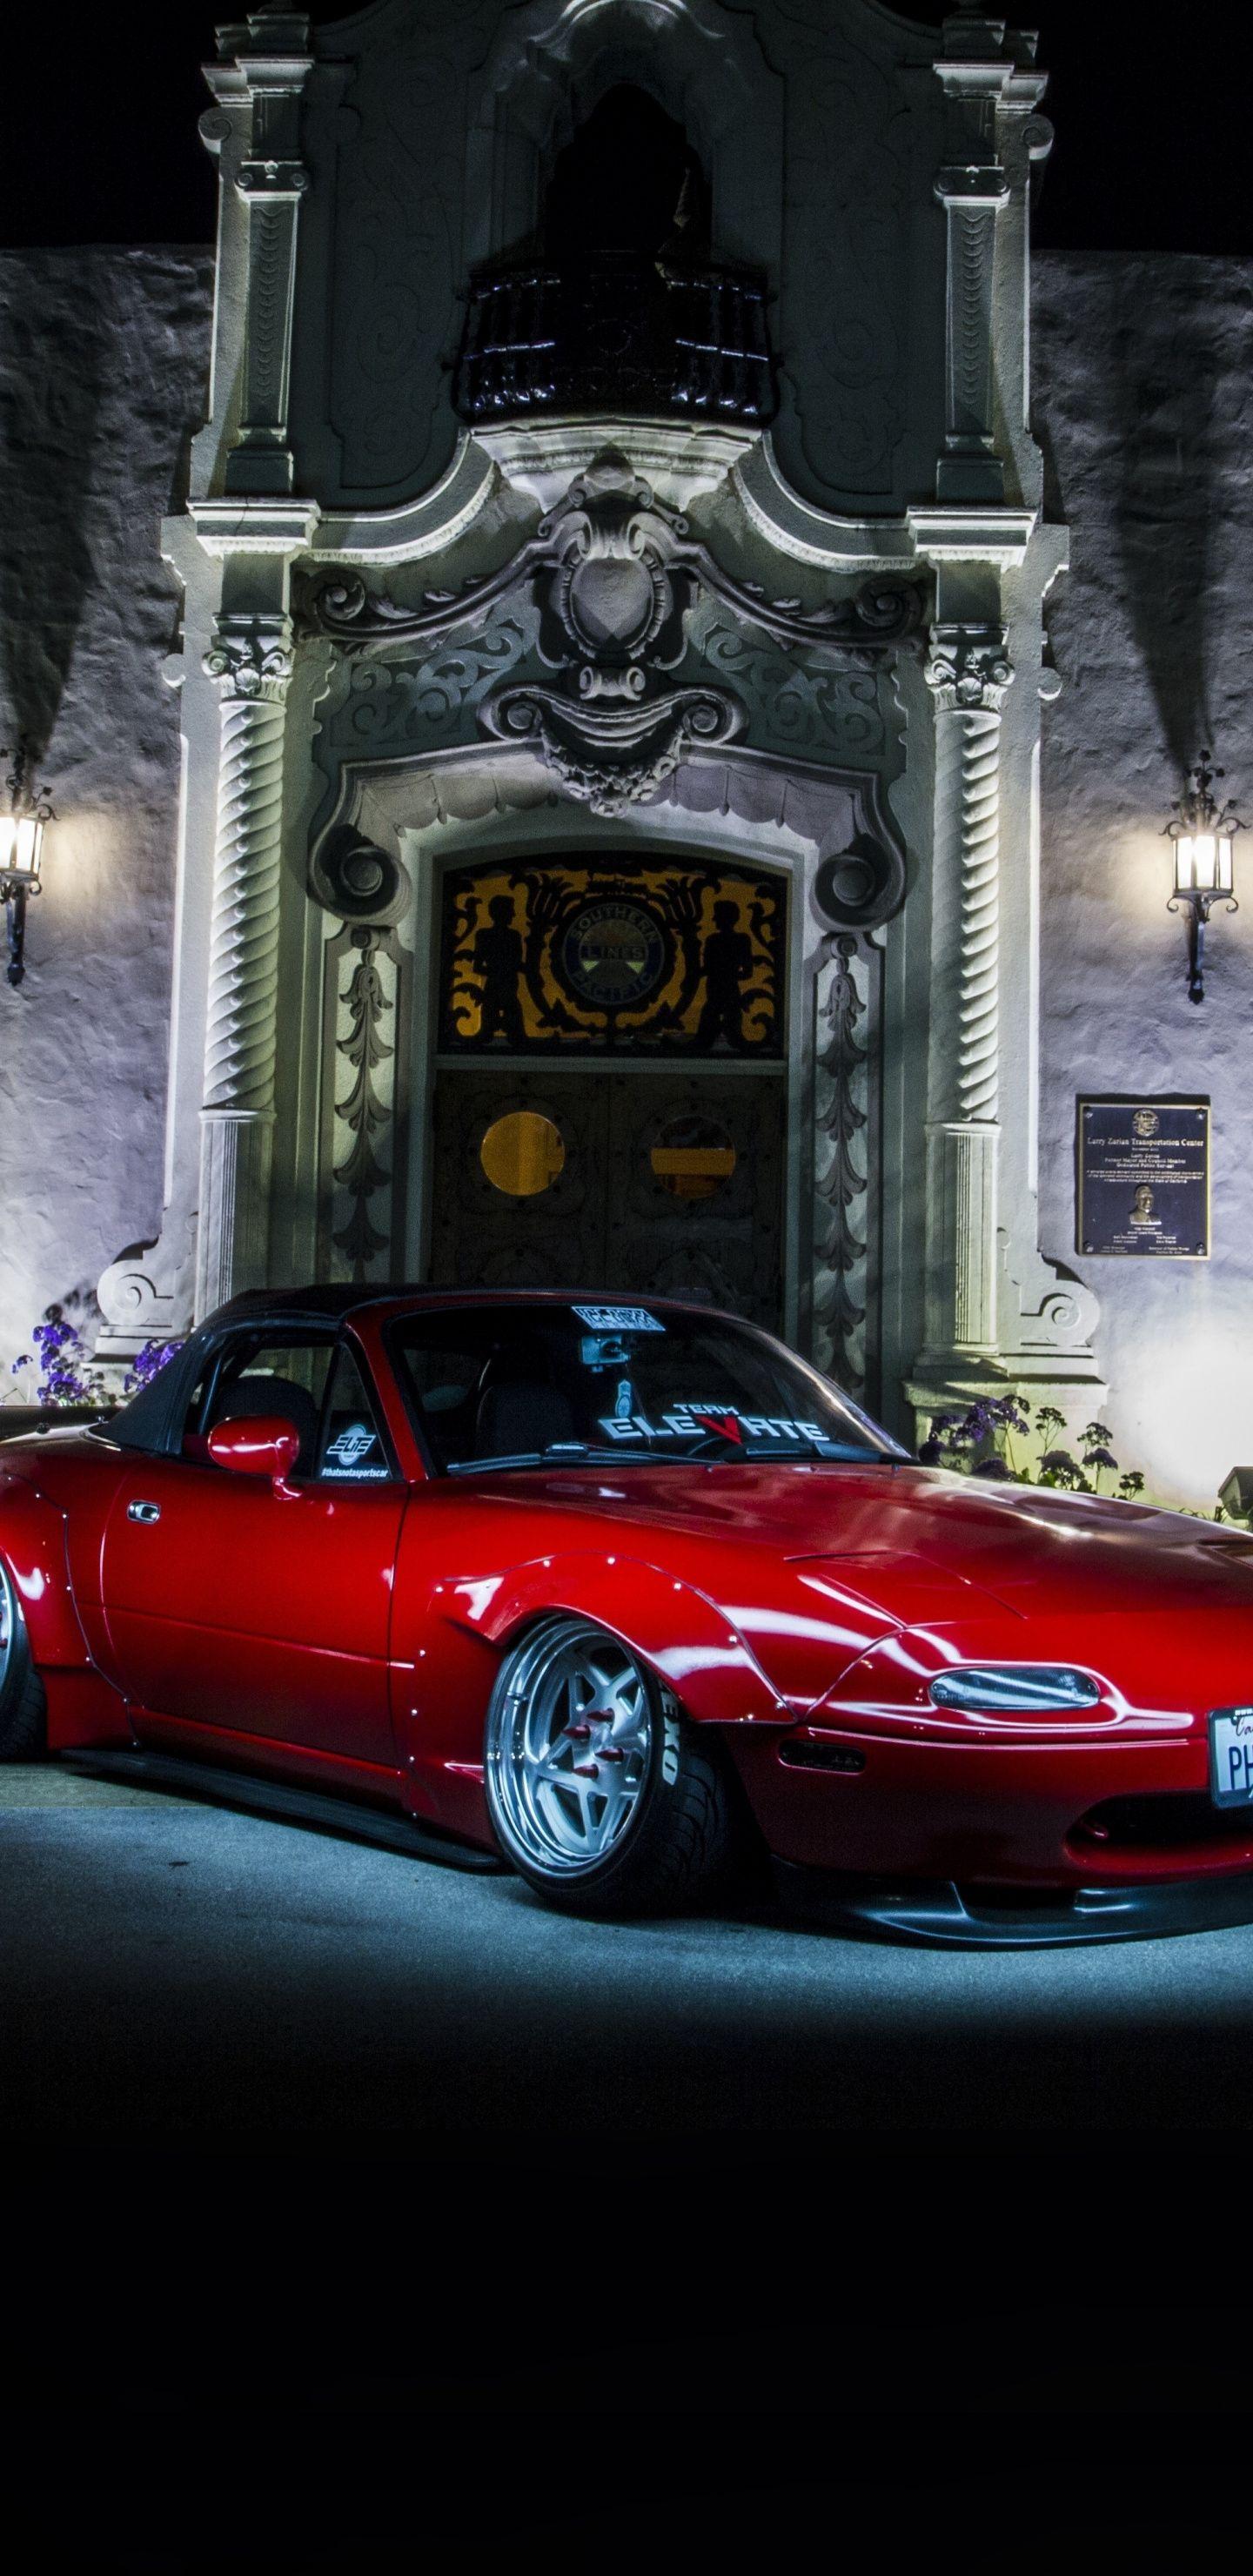 Red Sports Car Mazda Mx 5 Classic 1440x2960 Wallpaper Mazda